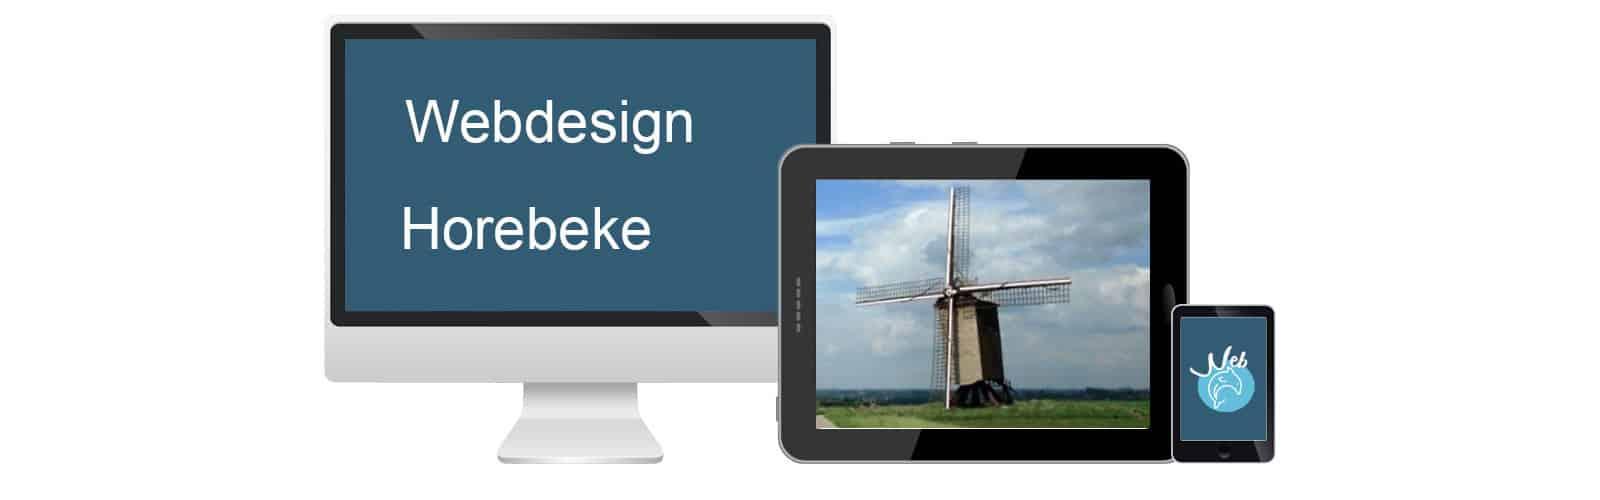 Webdesign Horebeke - webdolfijn